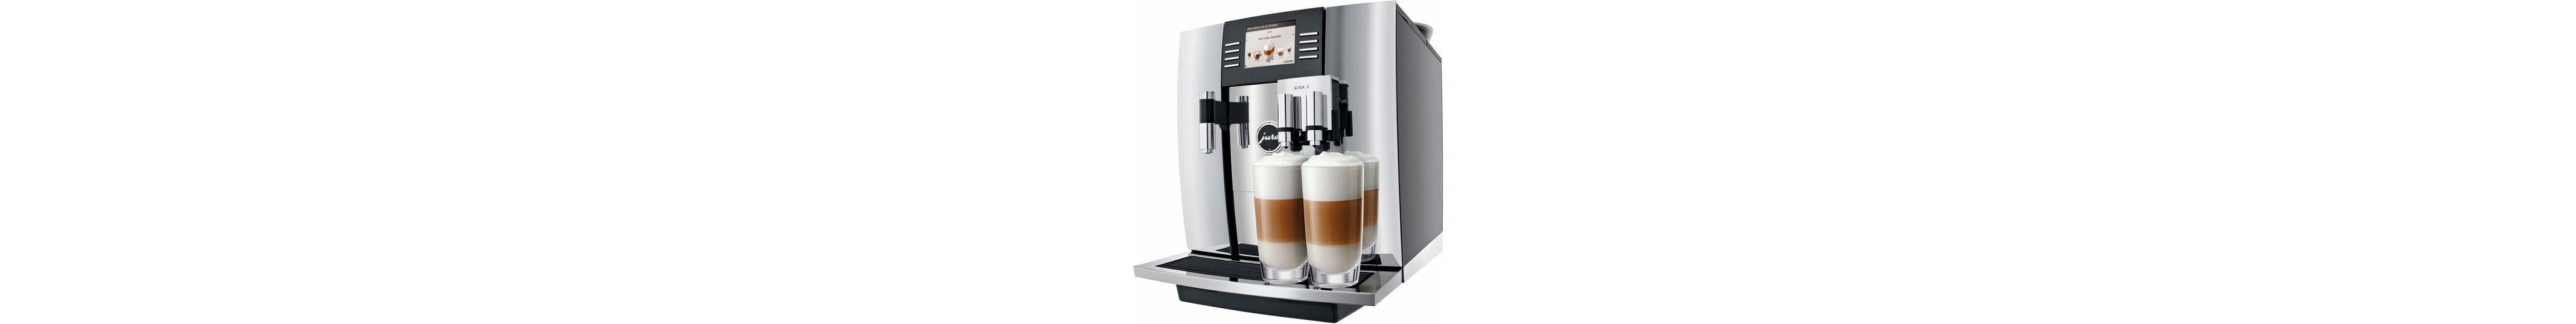 Jura Espresso-/Kaffee-Vollautomat GIGA 5, chrom